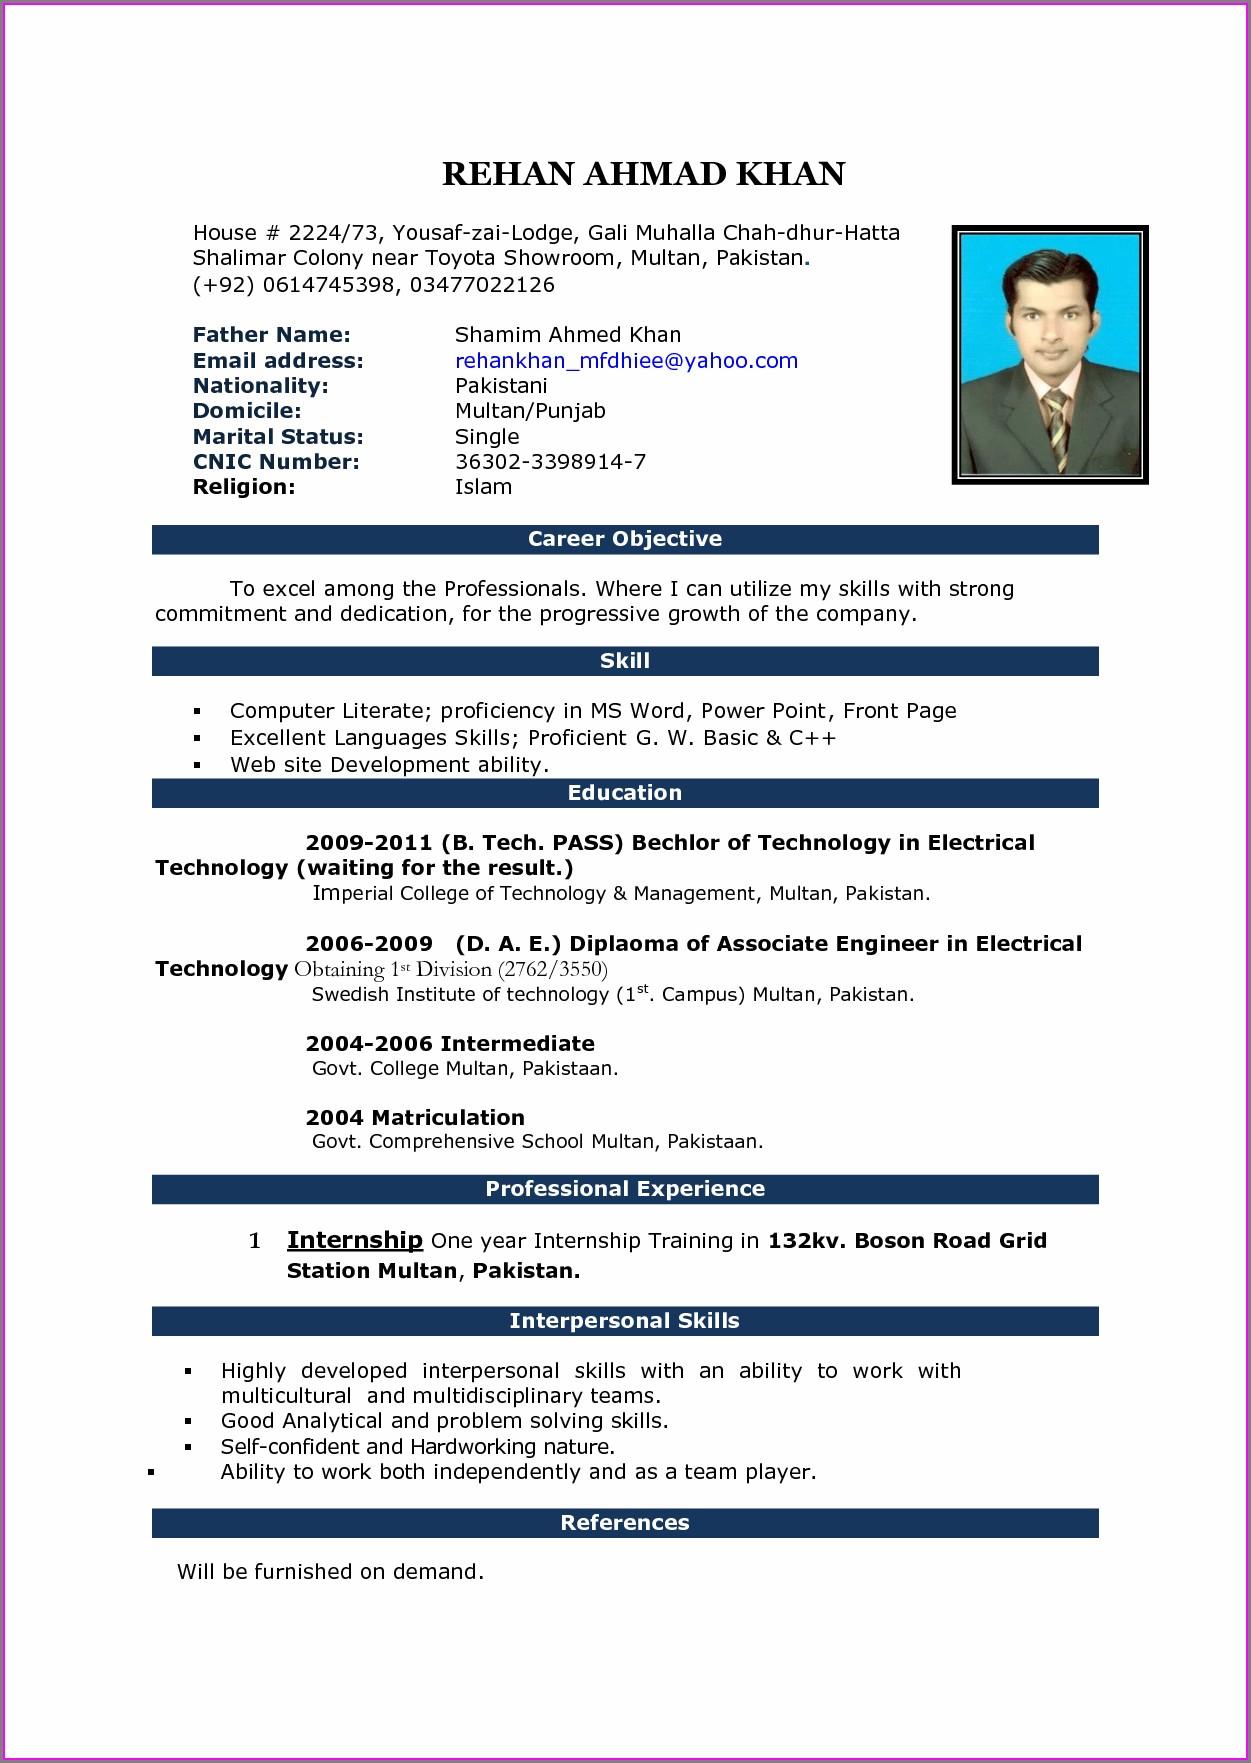 Simple Resume Format In Word For Teacher Job